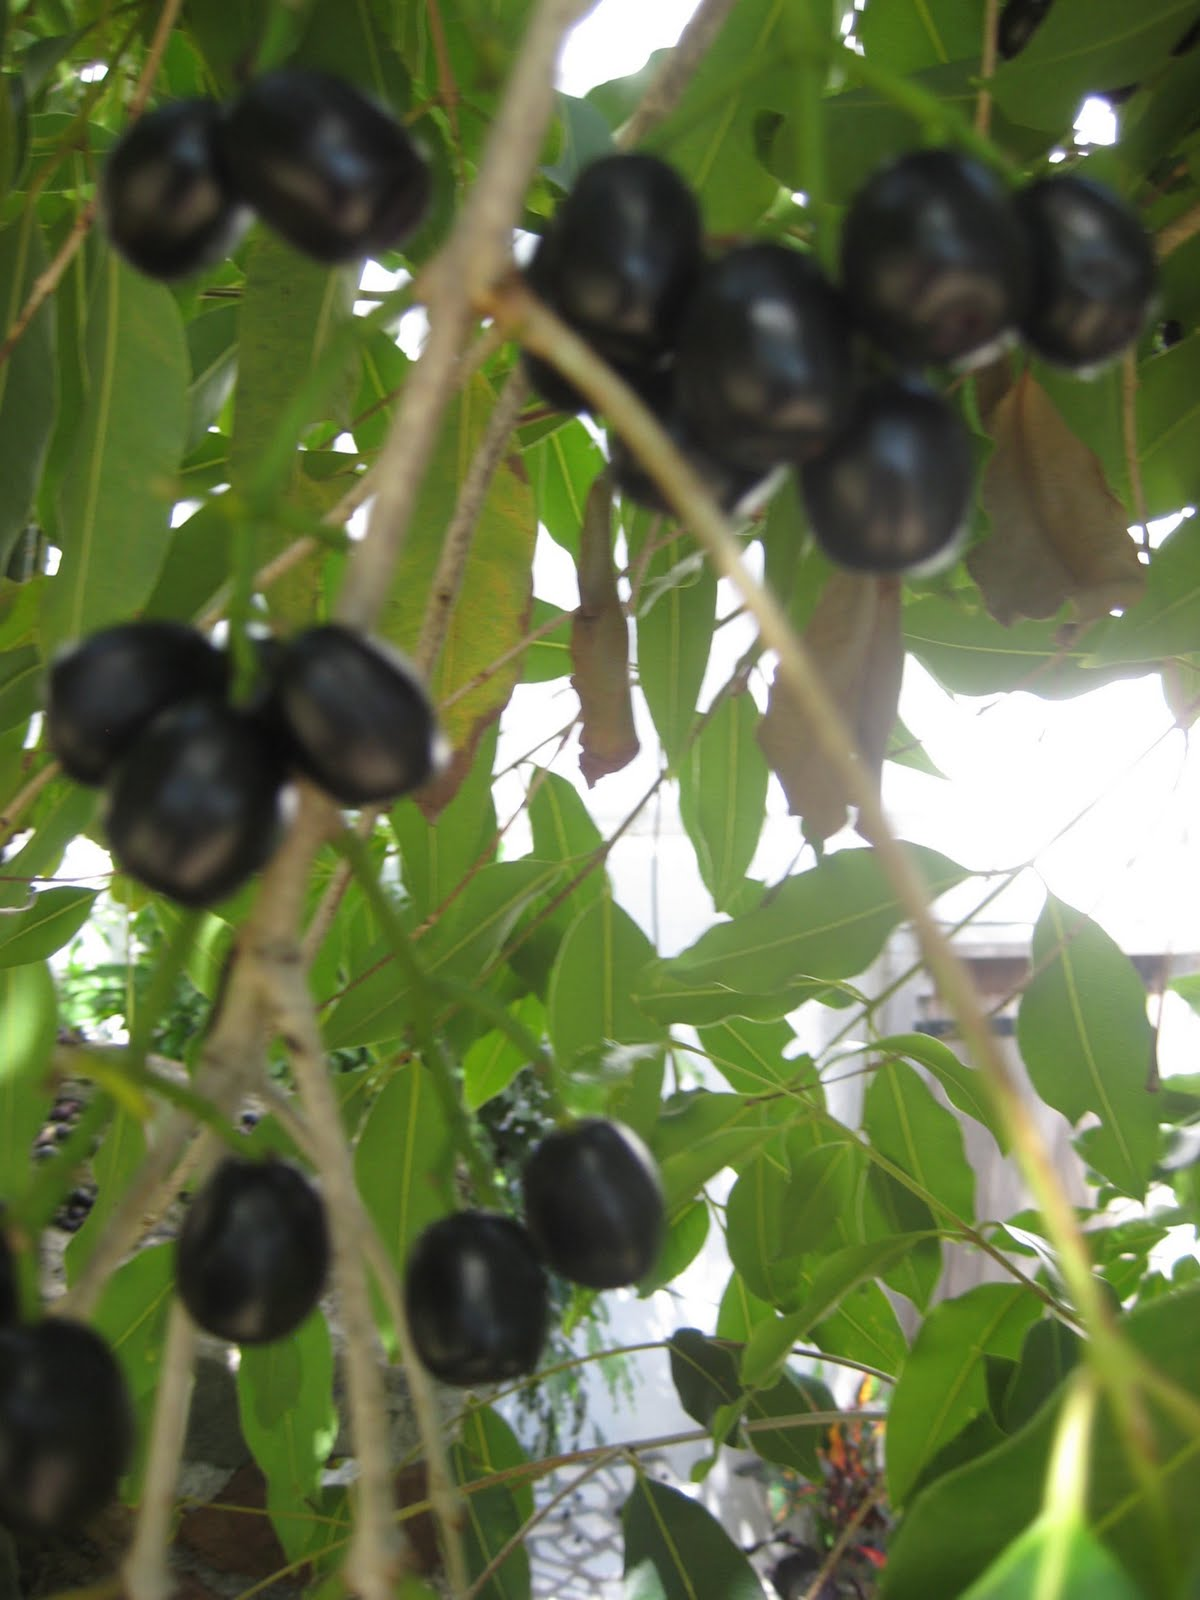 Wallpaper: Health Benefits of Jambul / Jamun (Syzygium Cumini)